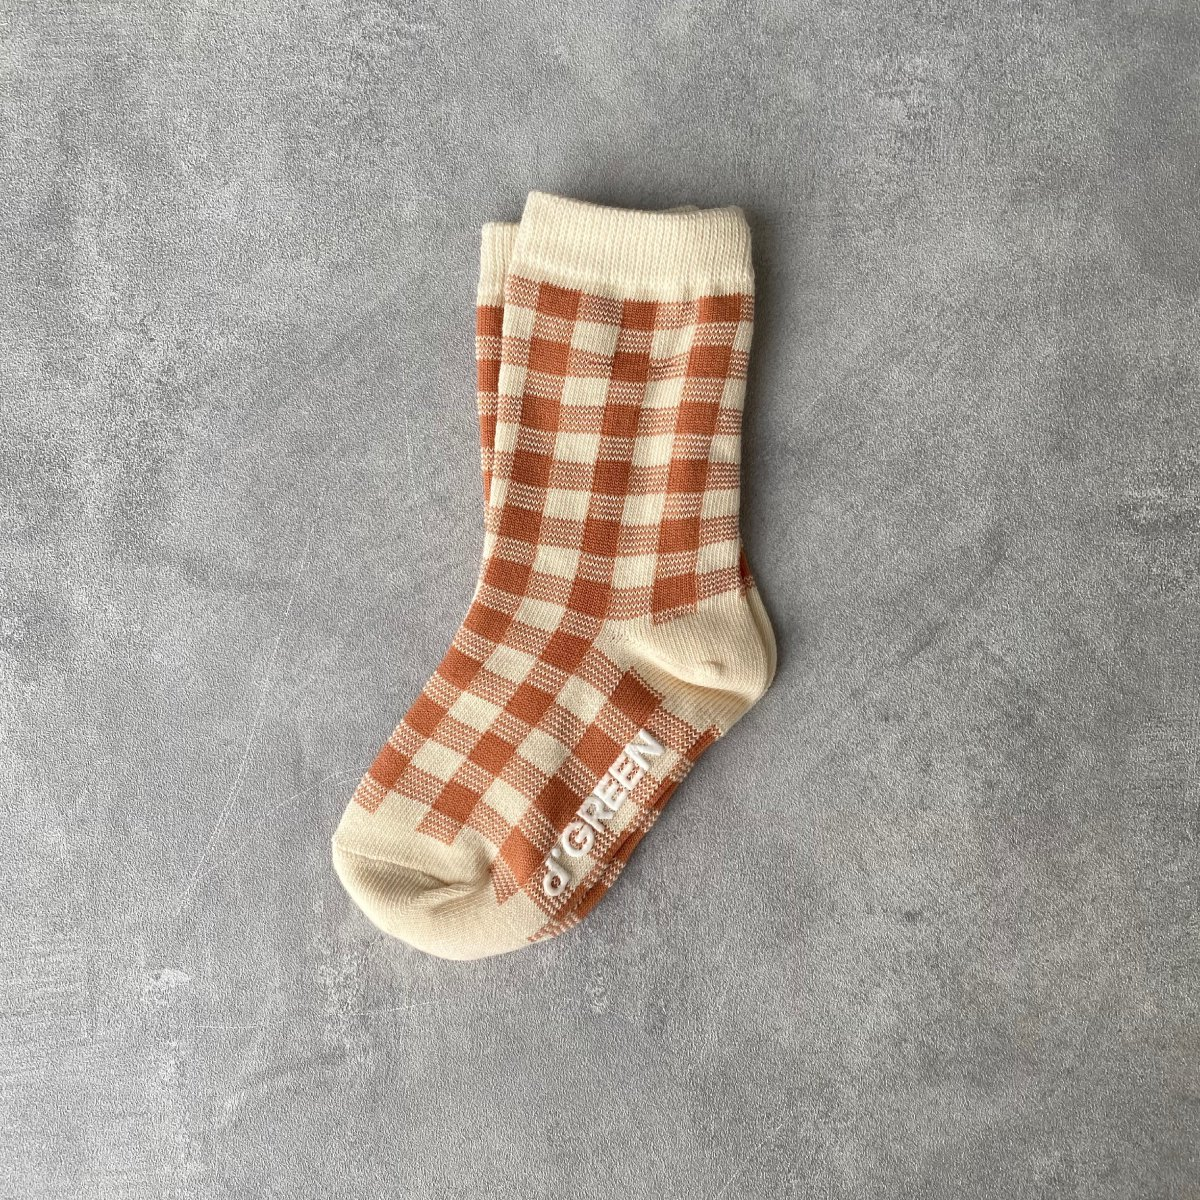 【KIDS】Natural Check Socks 詳細画像4